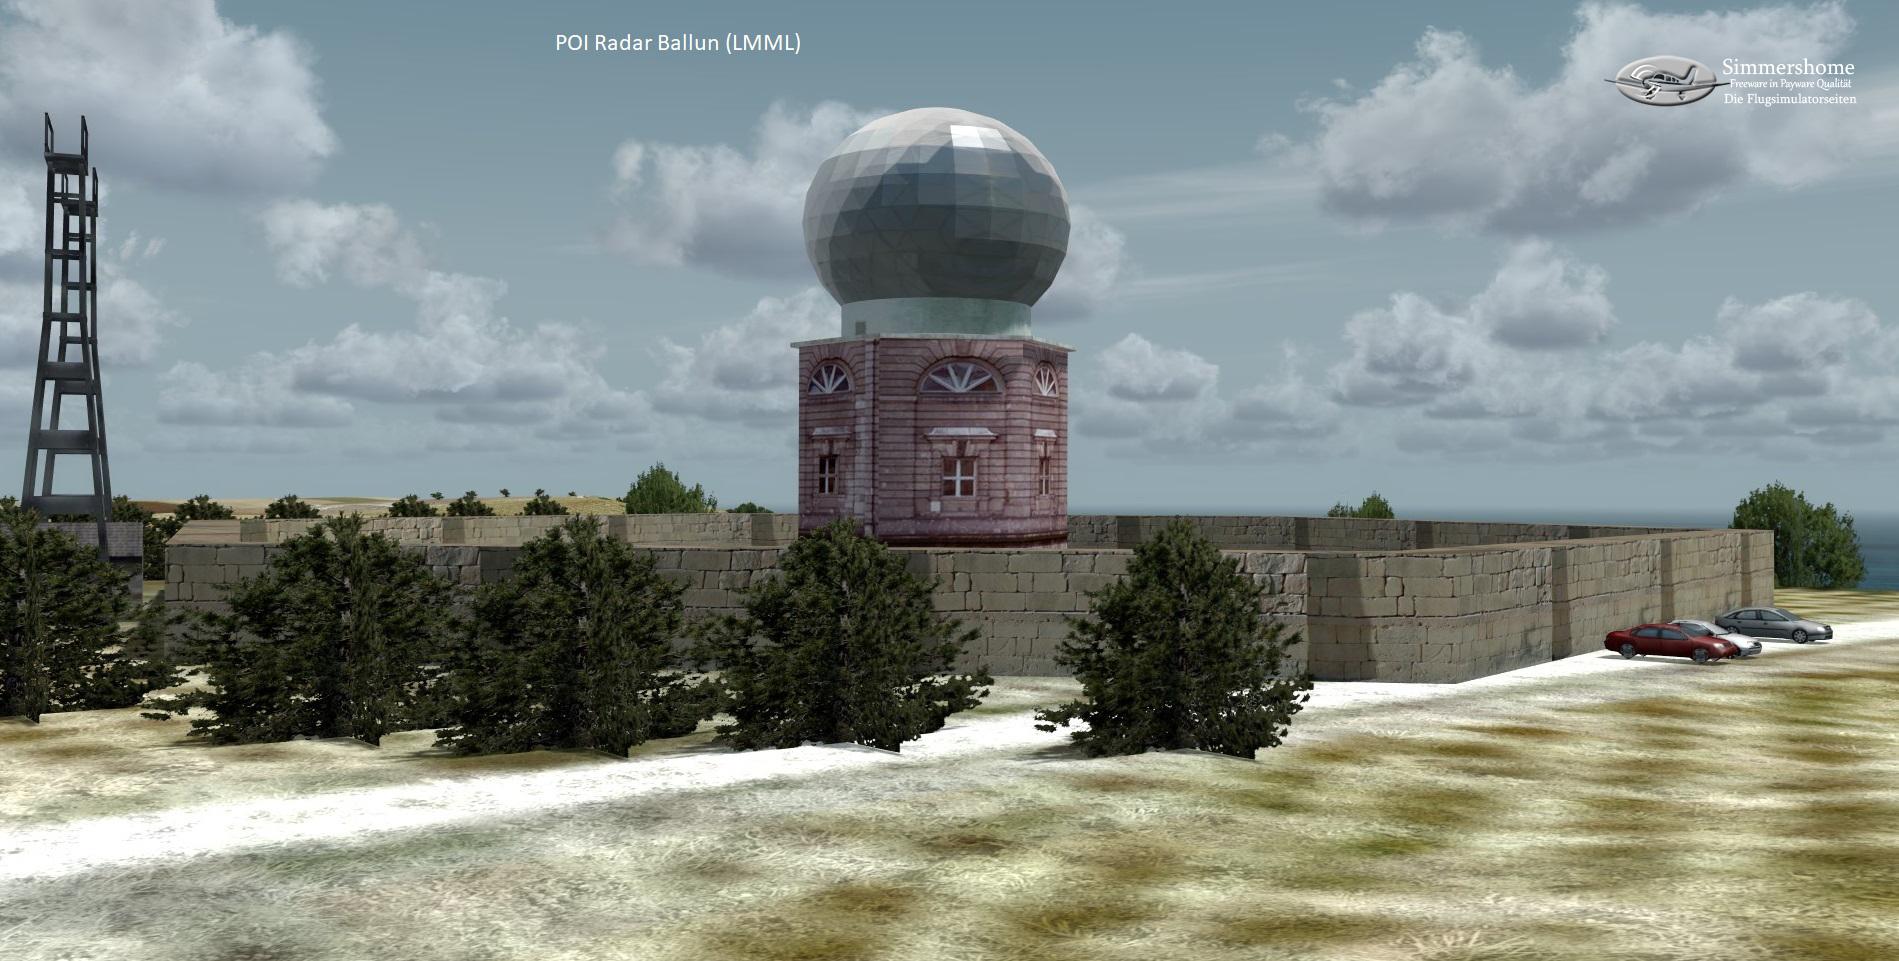 radarballunnah1yf5k.jpg